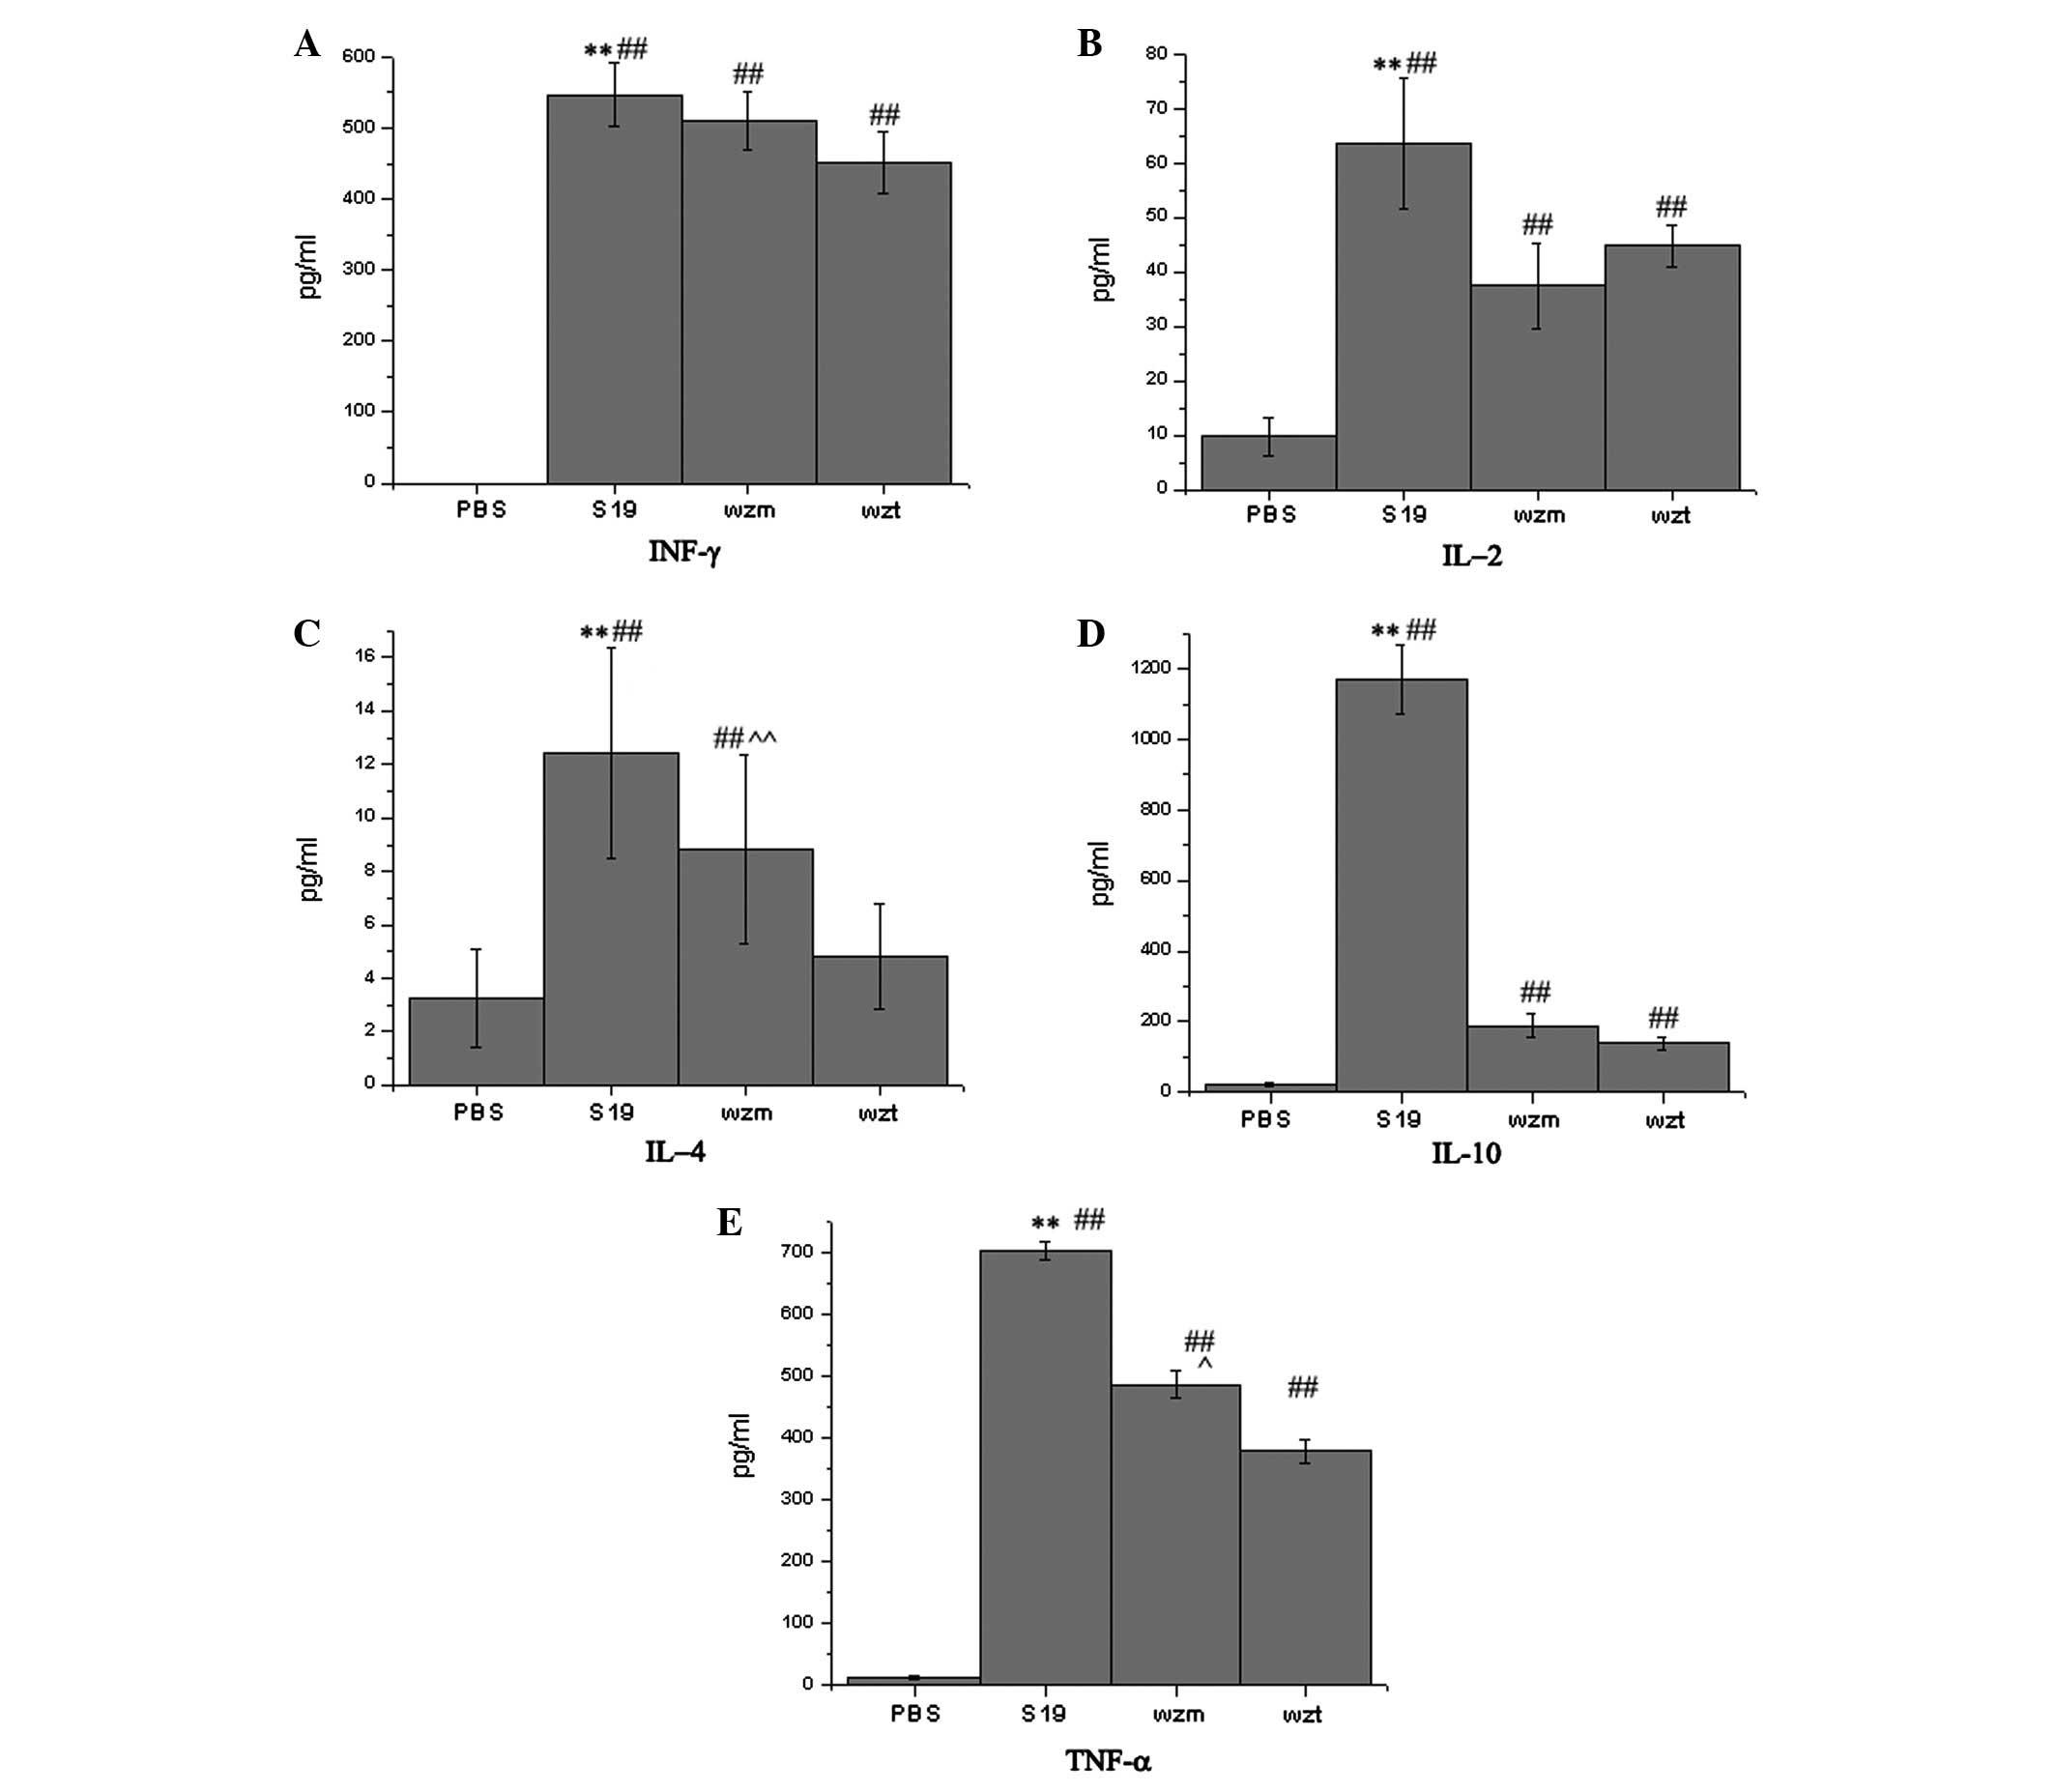 Immunogenic Response Induced By Wzm And Wzt Gene Deletion